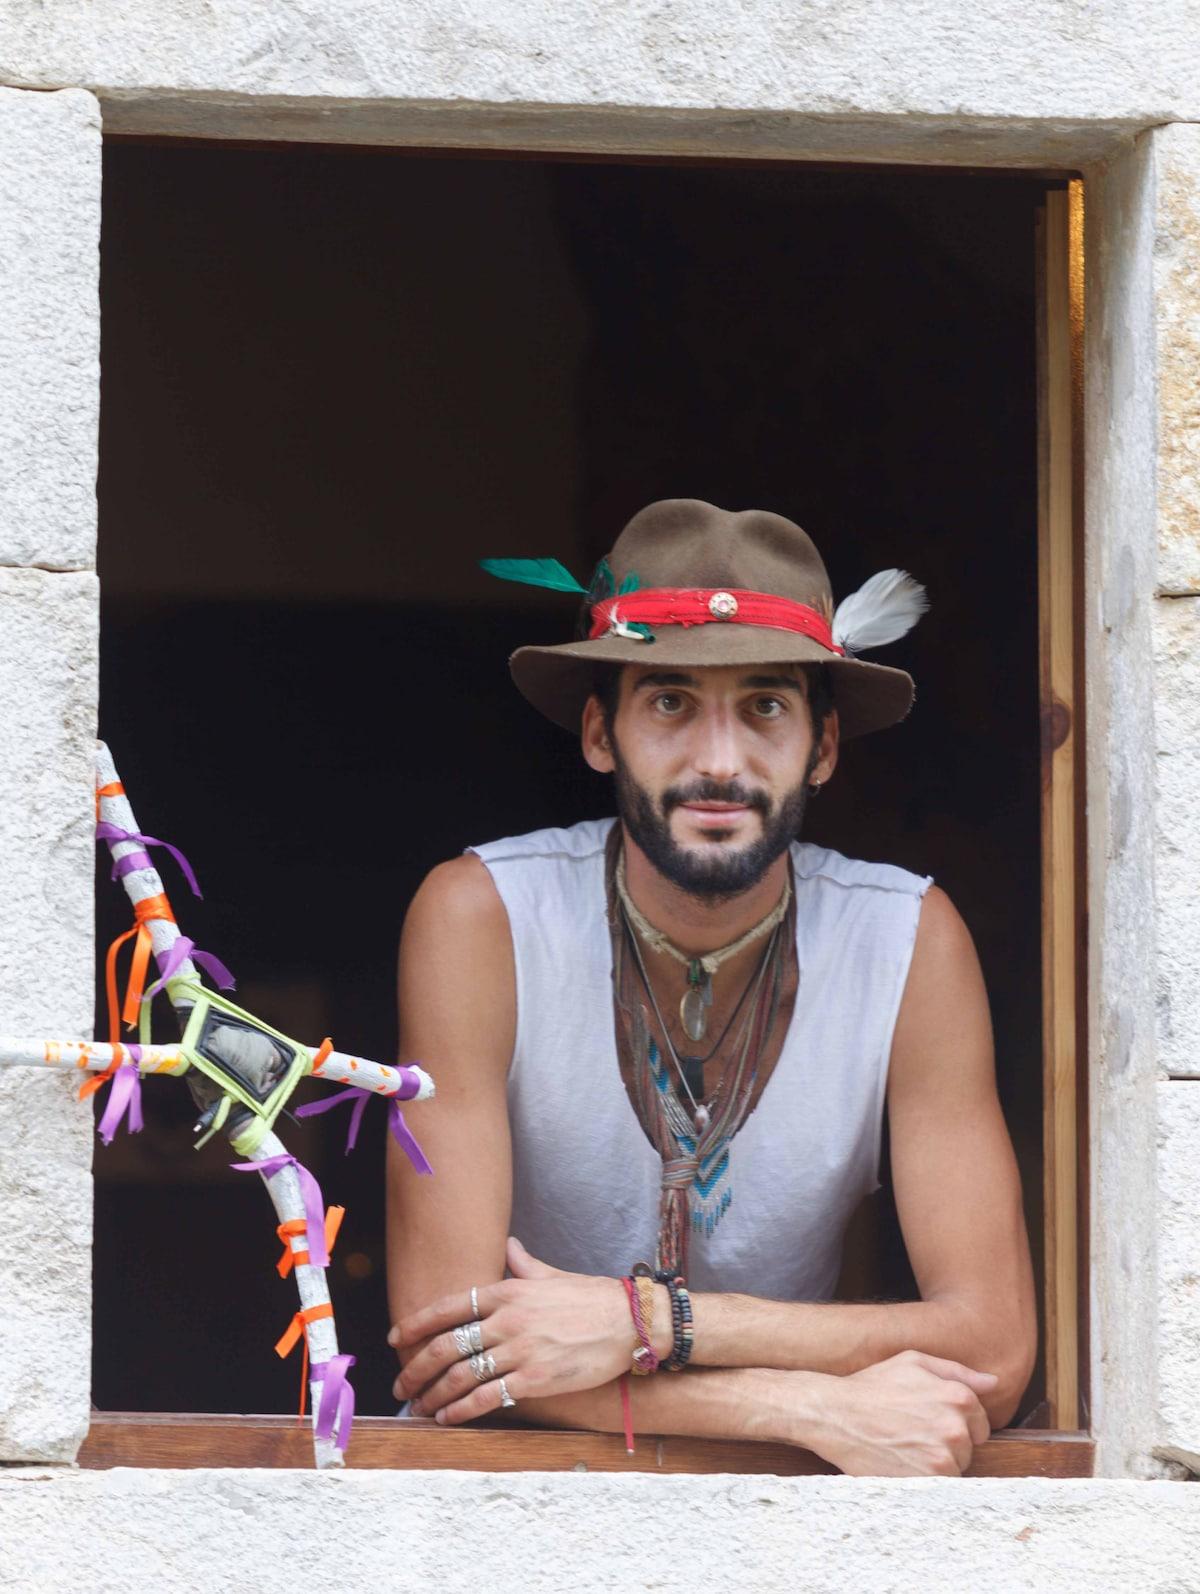 Esteve Tlayoltehuiani Vicens Pinto from Caldes de Malavella